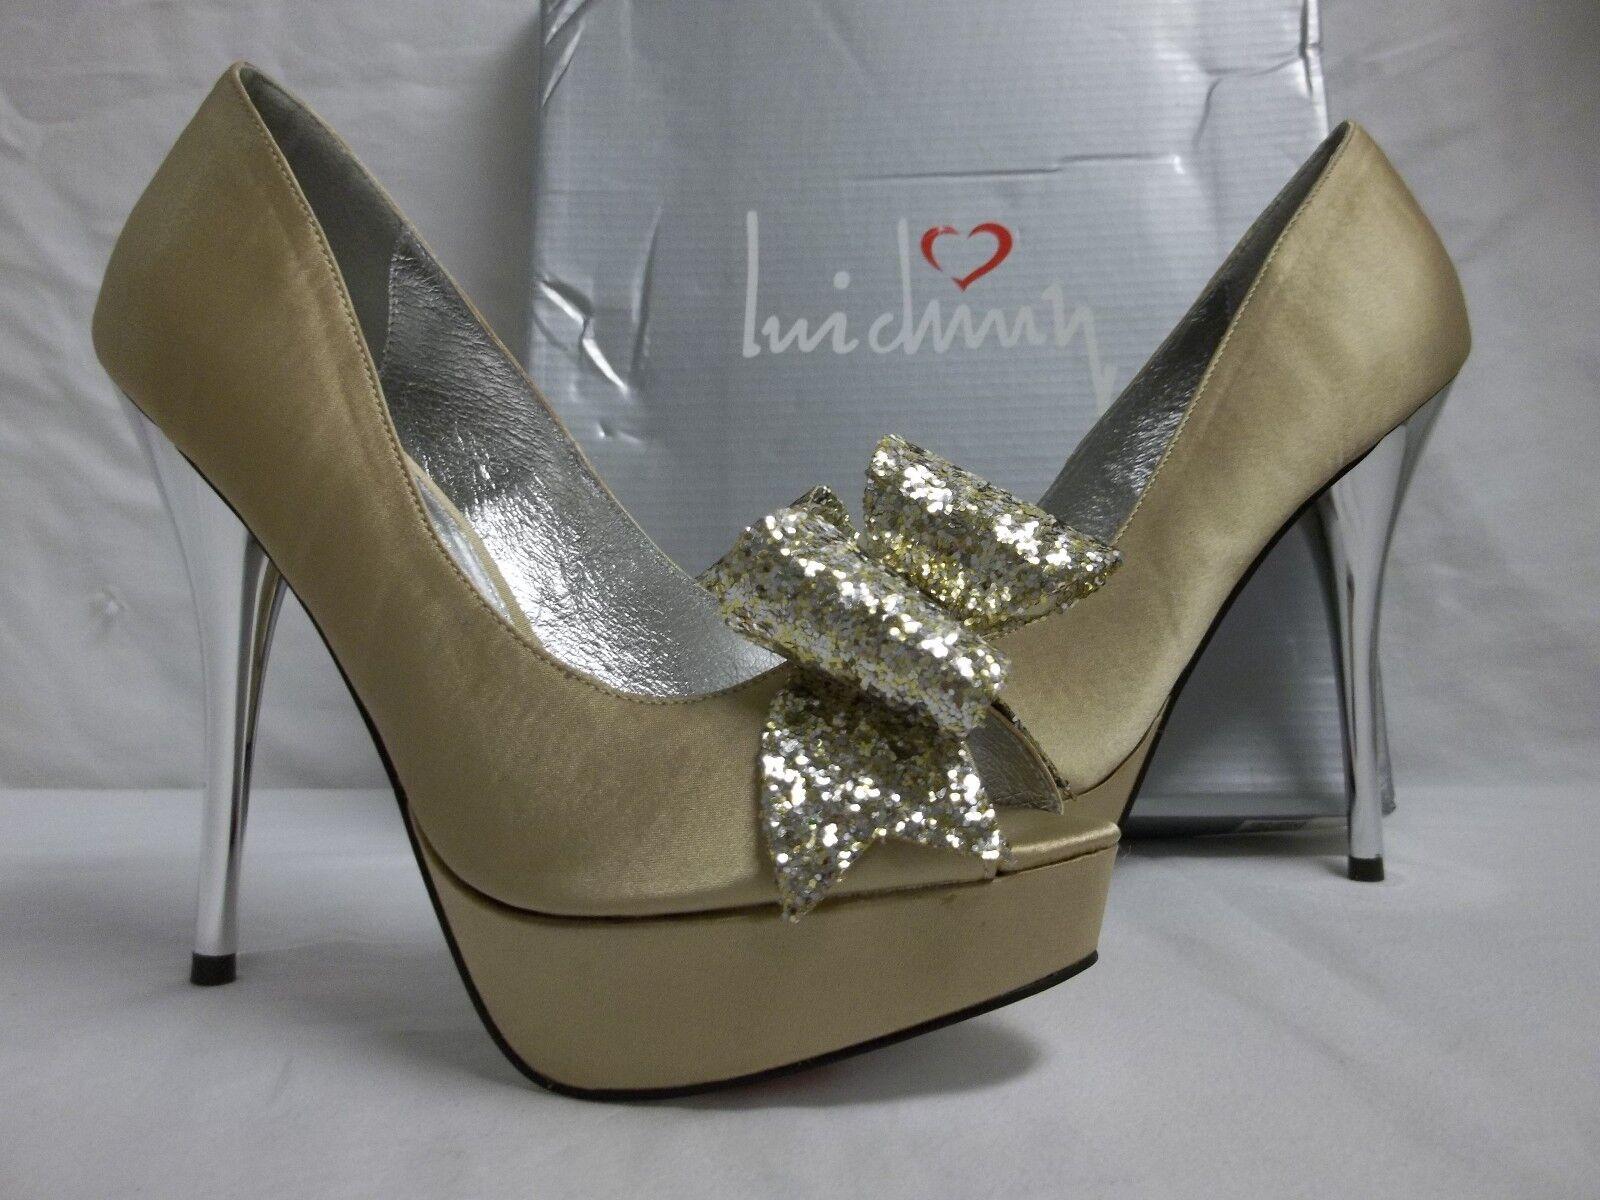 Luichiny Größe 8 M Kissy Kiss Beige Satin Open Toe Heels NEU Damenschuhe Schuhes